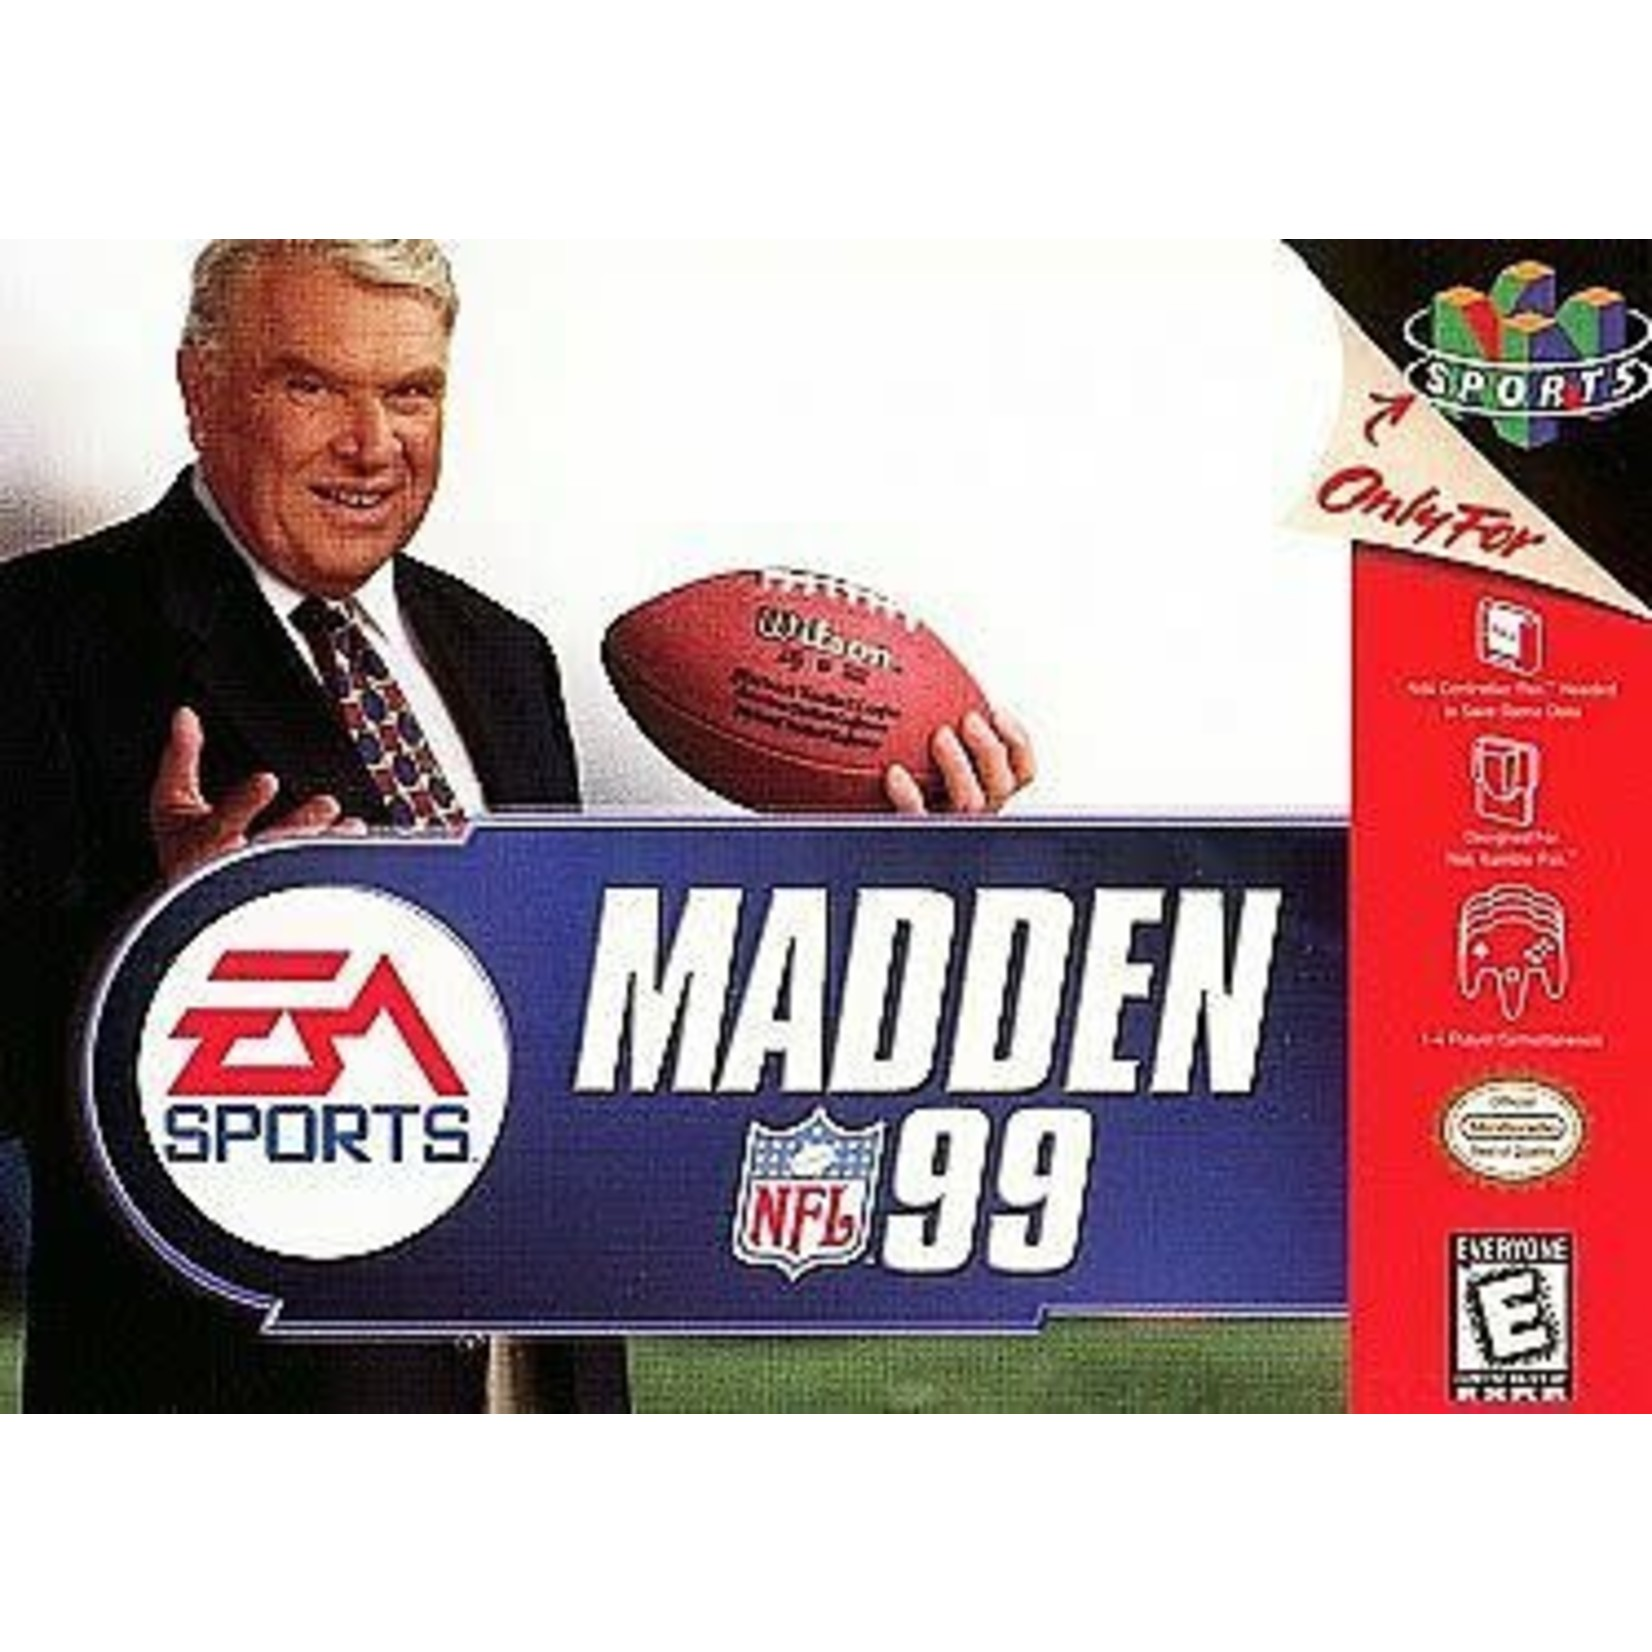 n64u-Madden 99 (in box)